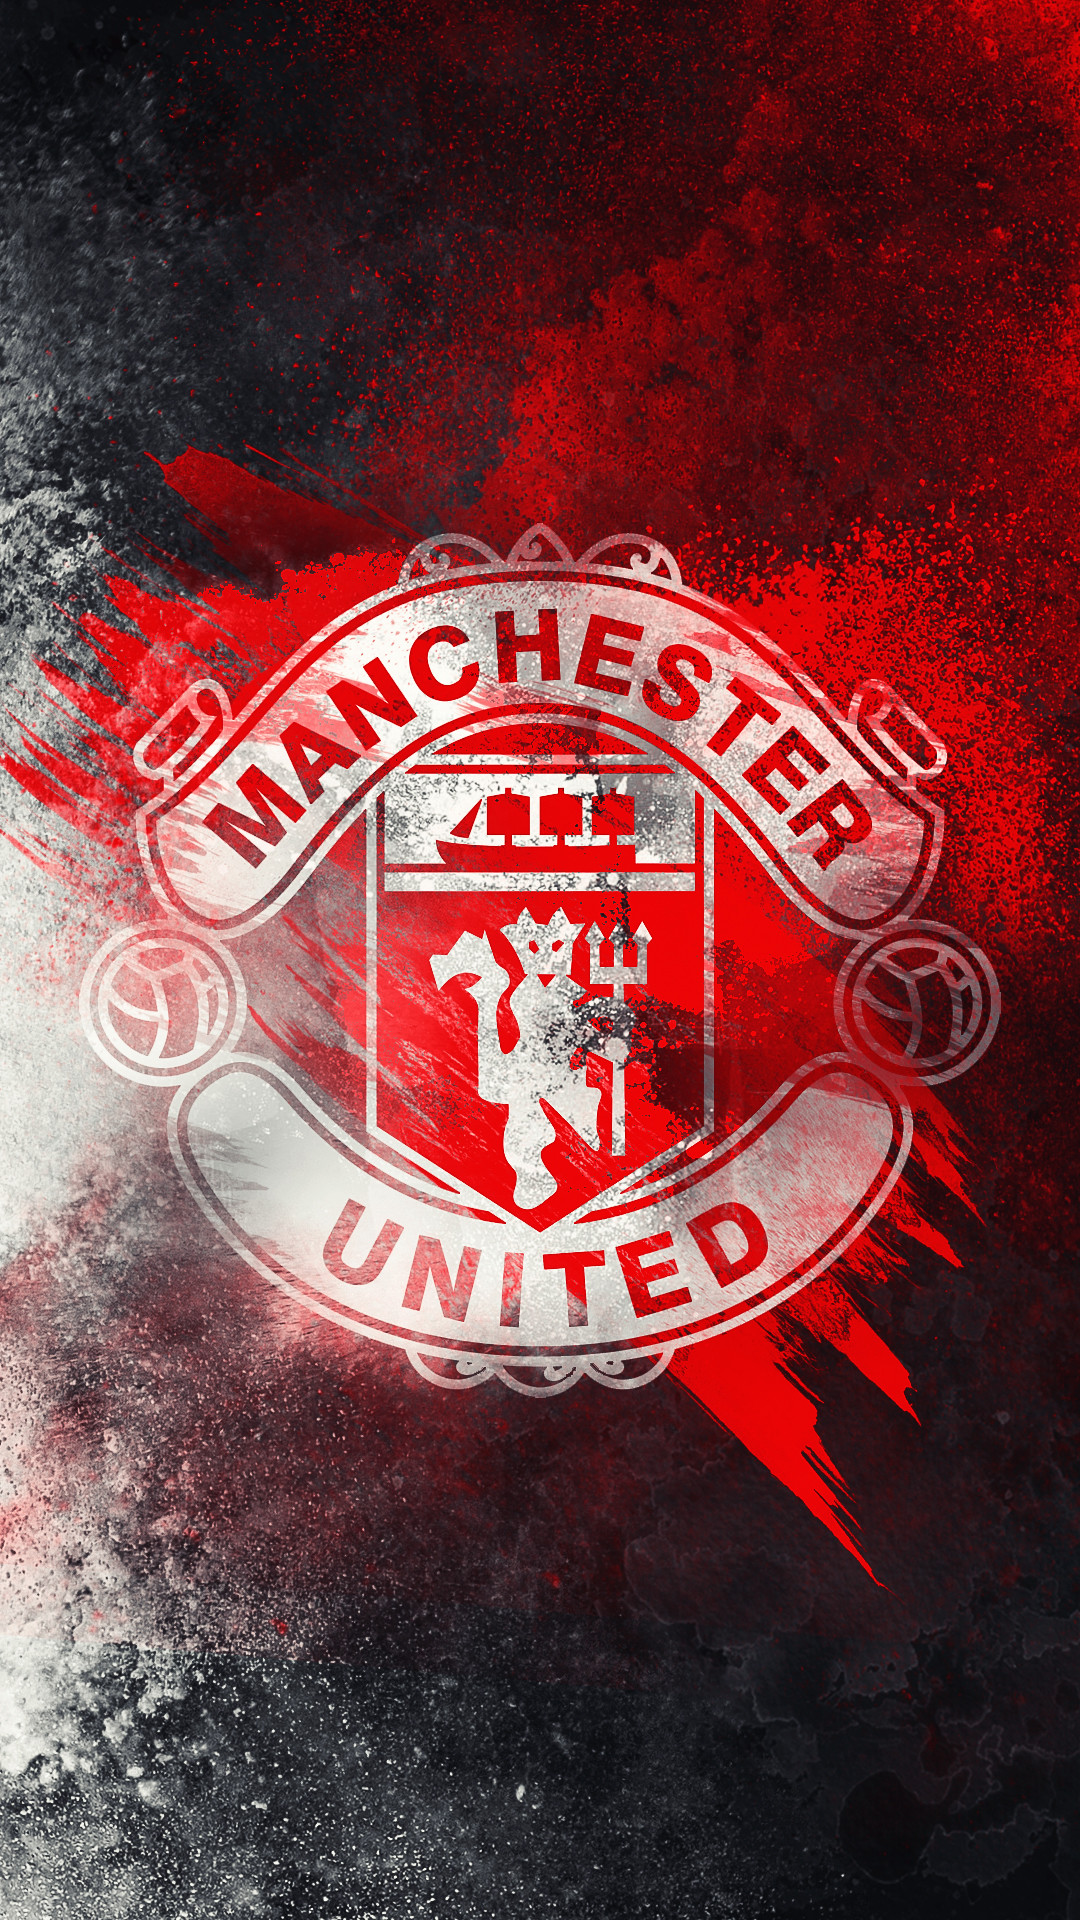 Iphone 6s Plus Wallpaper Hd Manchester United Logo Wallpaper Hd 2017 183 ①